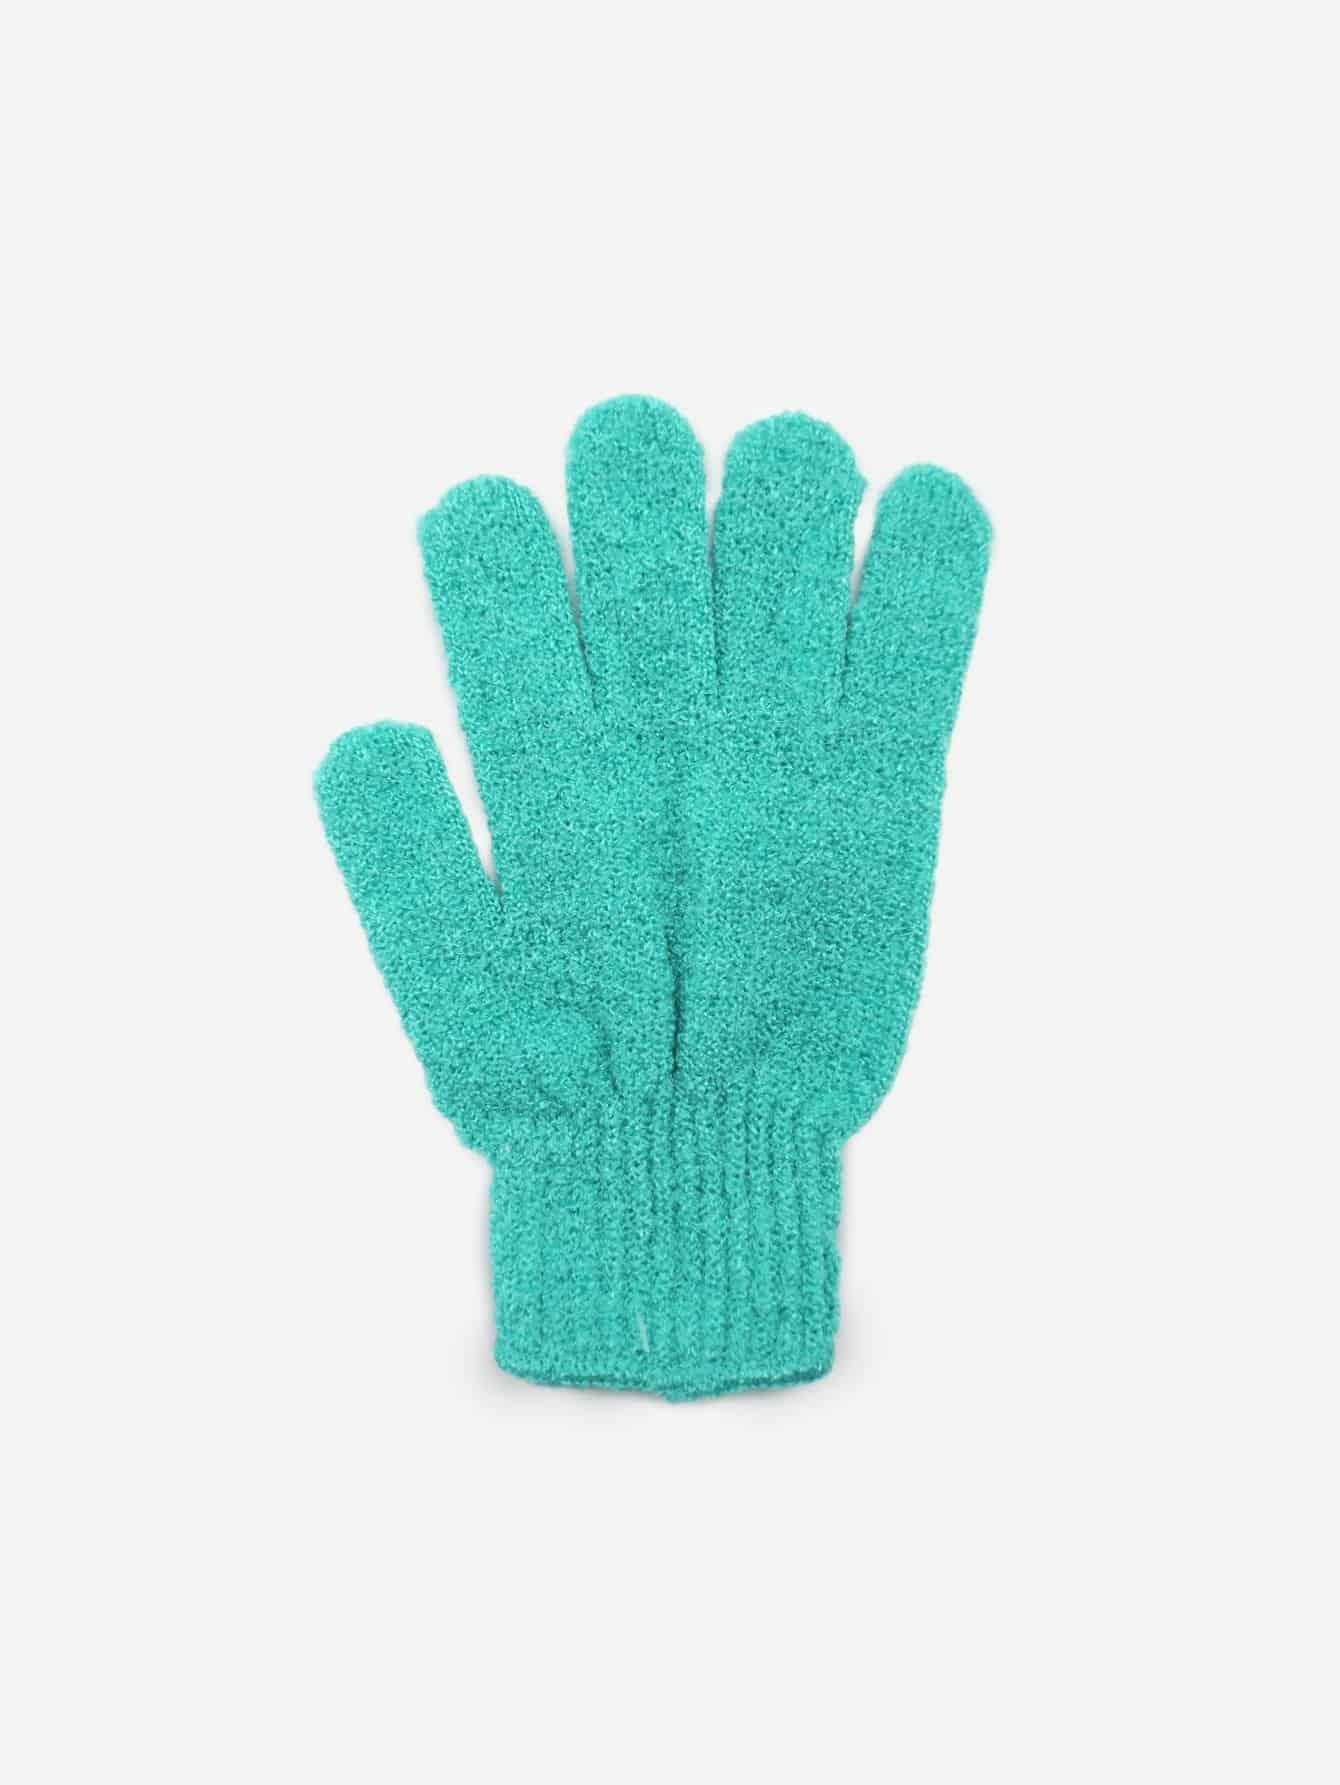 Купить Отшелушивающий душ перчатка, null, SheIn